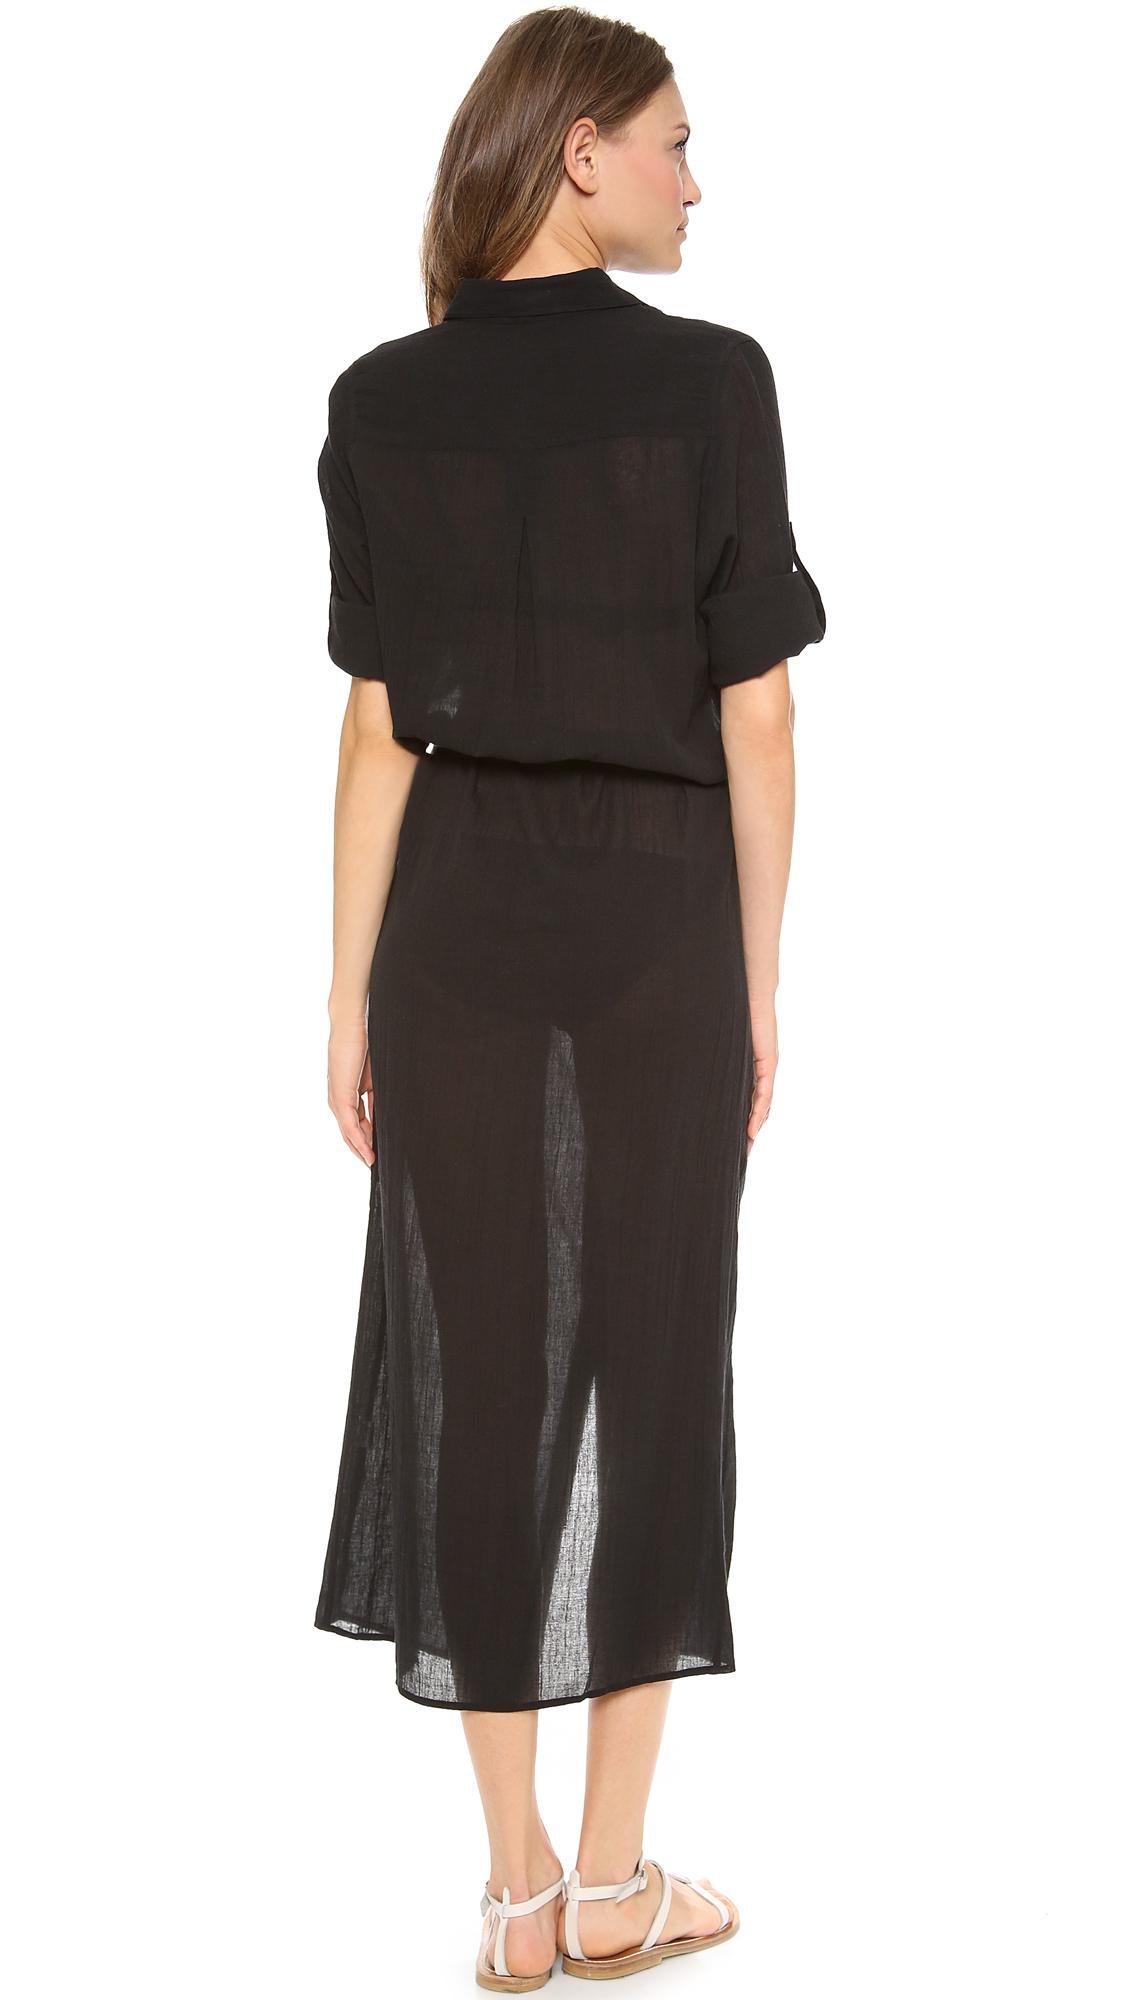 Thayer Shirt Dress Cover Up White Gauze In Black Lyst